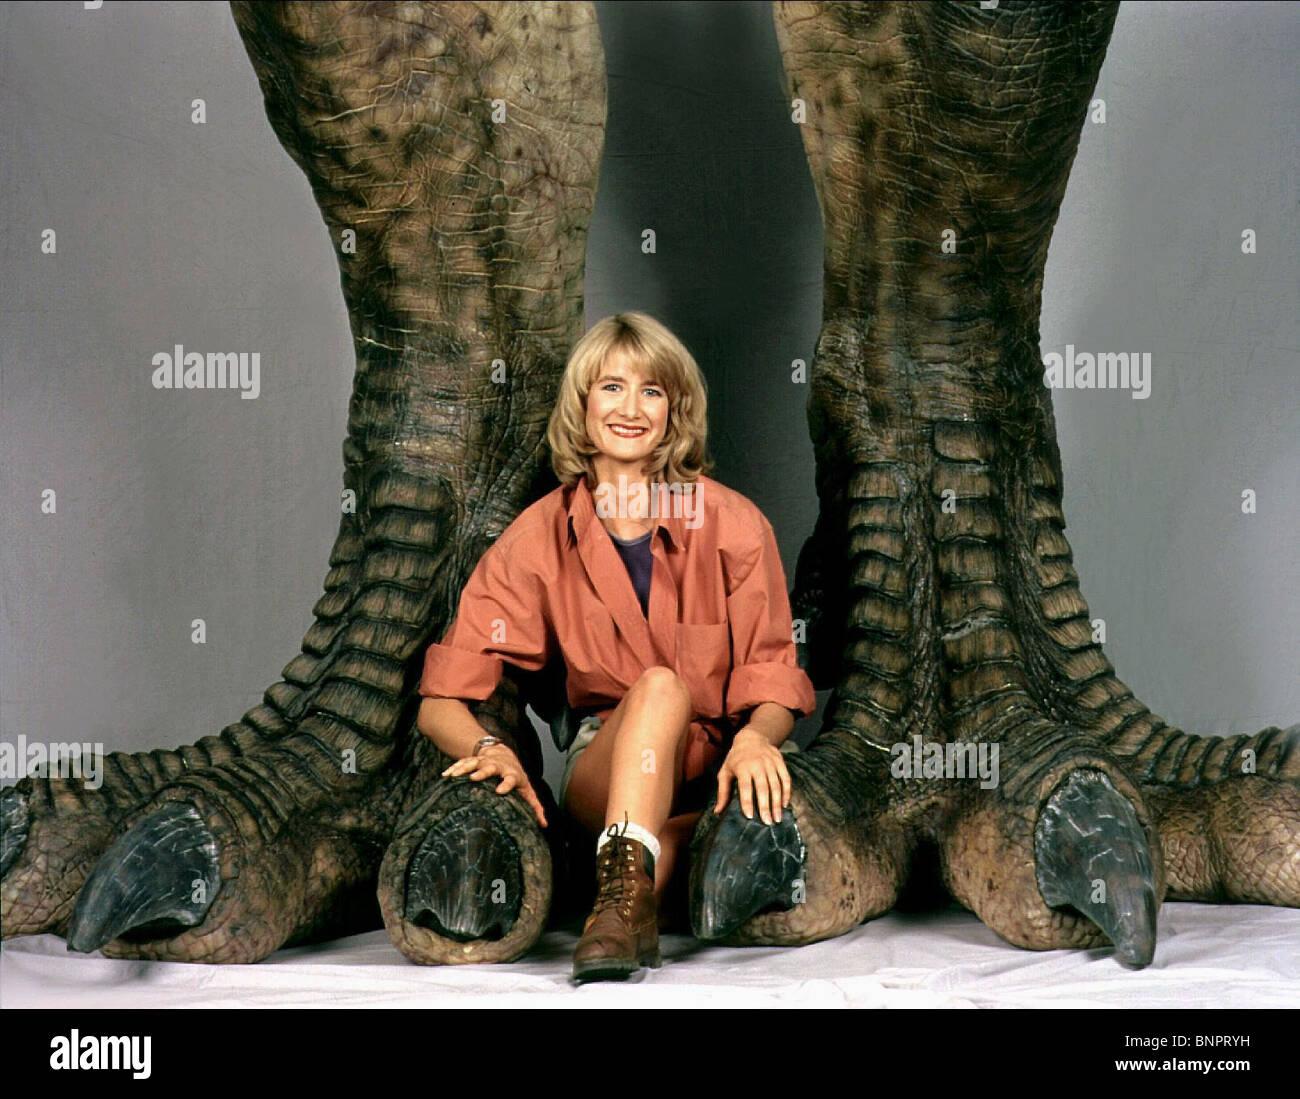 LAURA DERN JURASSIC PARK (1993) - Stock Image